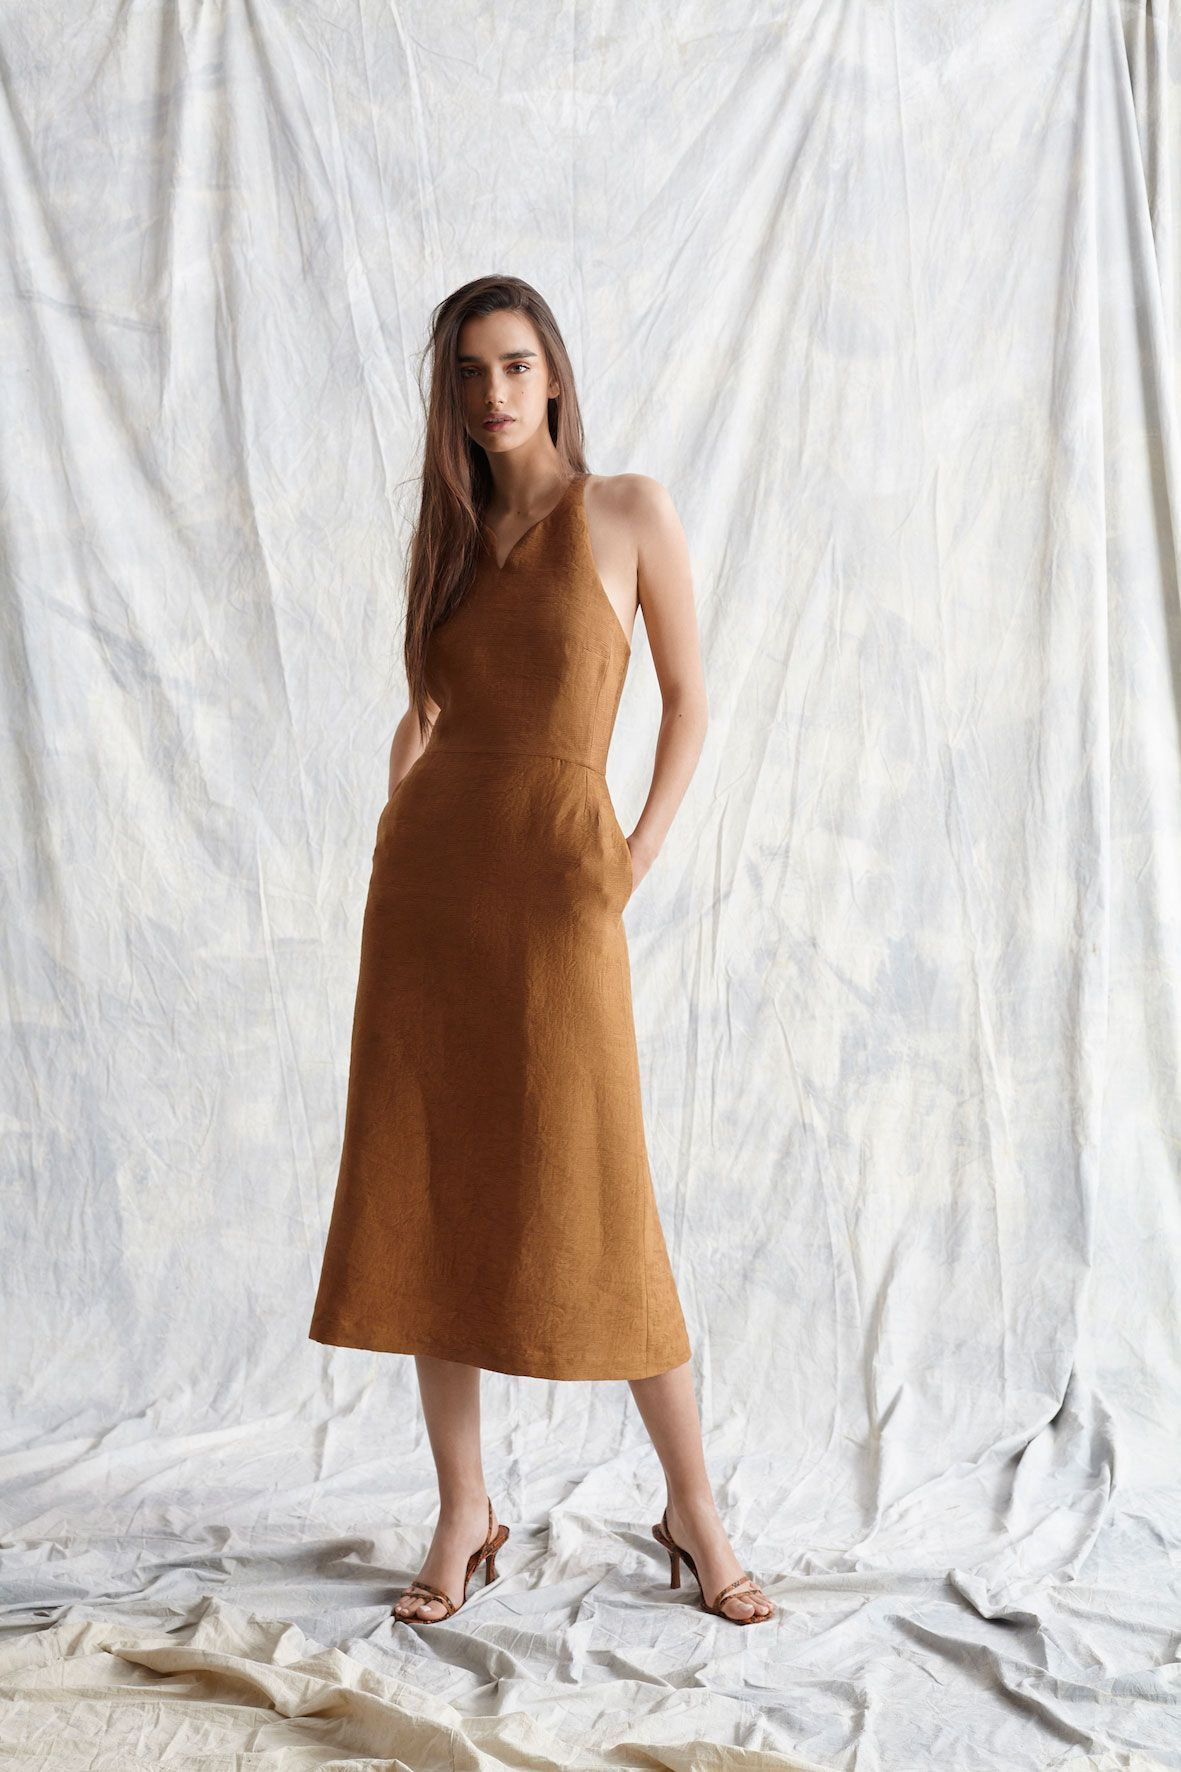 diseñadora-de-moda-Fiona Dress